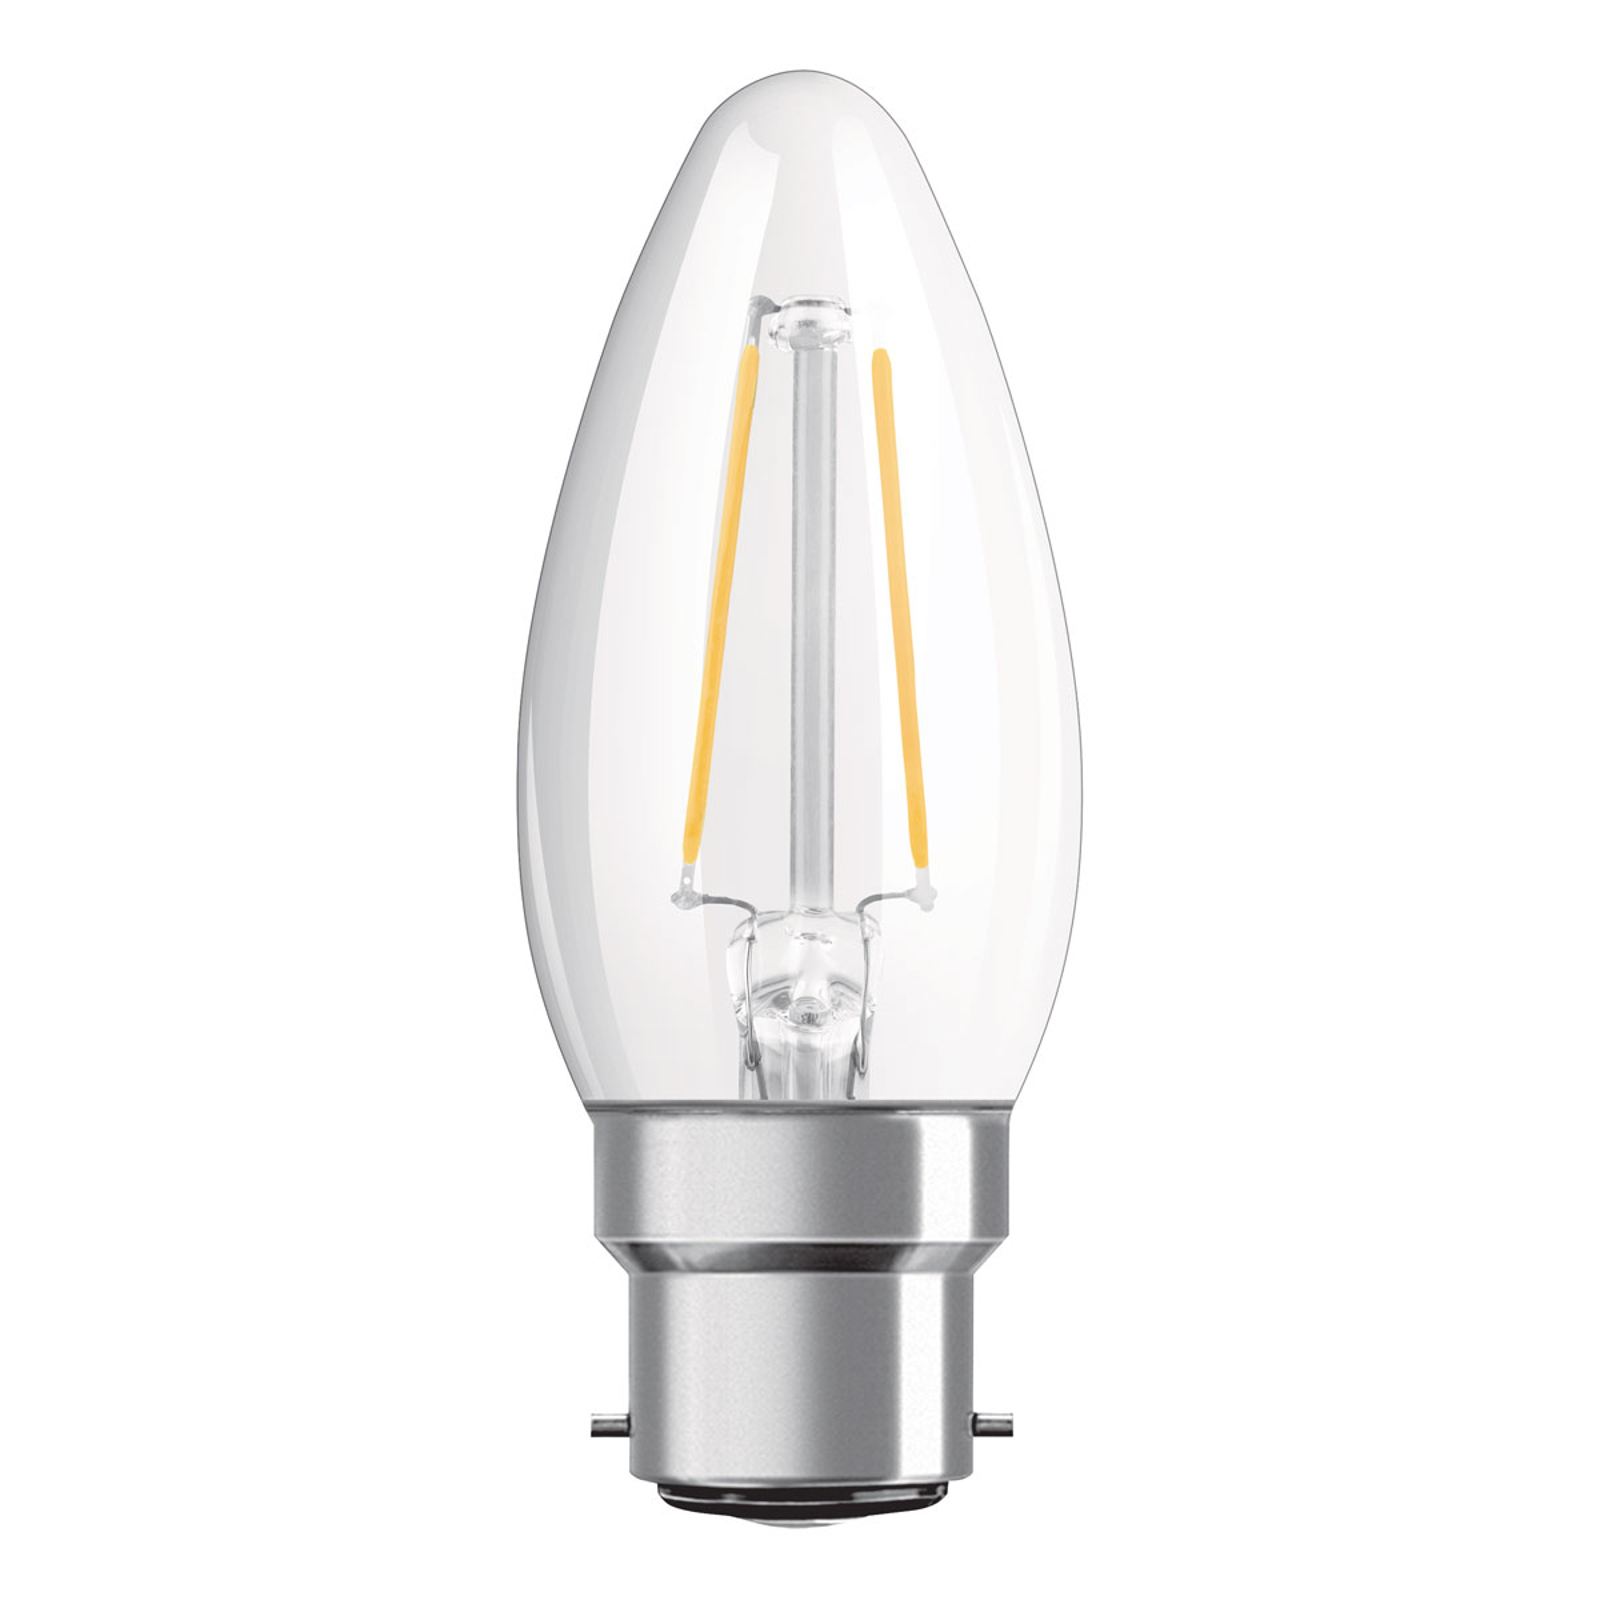 OSRAM-LED-kynttilä B22d Classic 827 4W kirkas